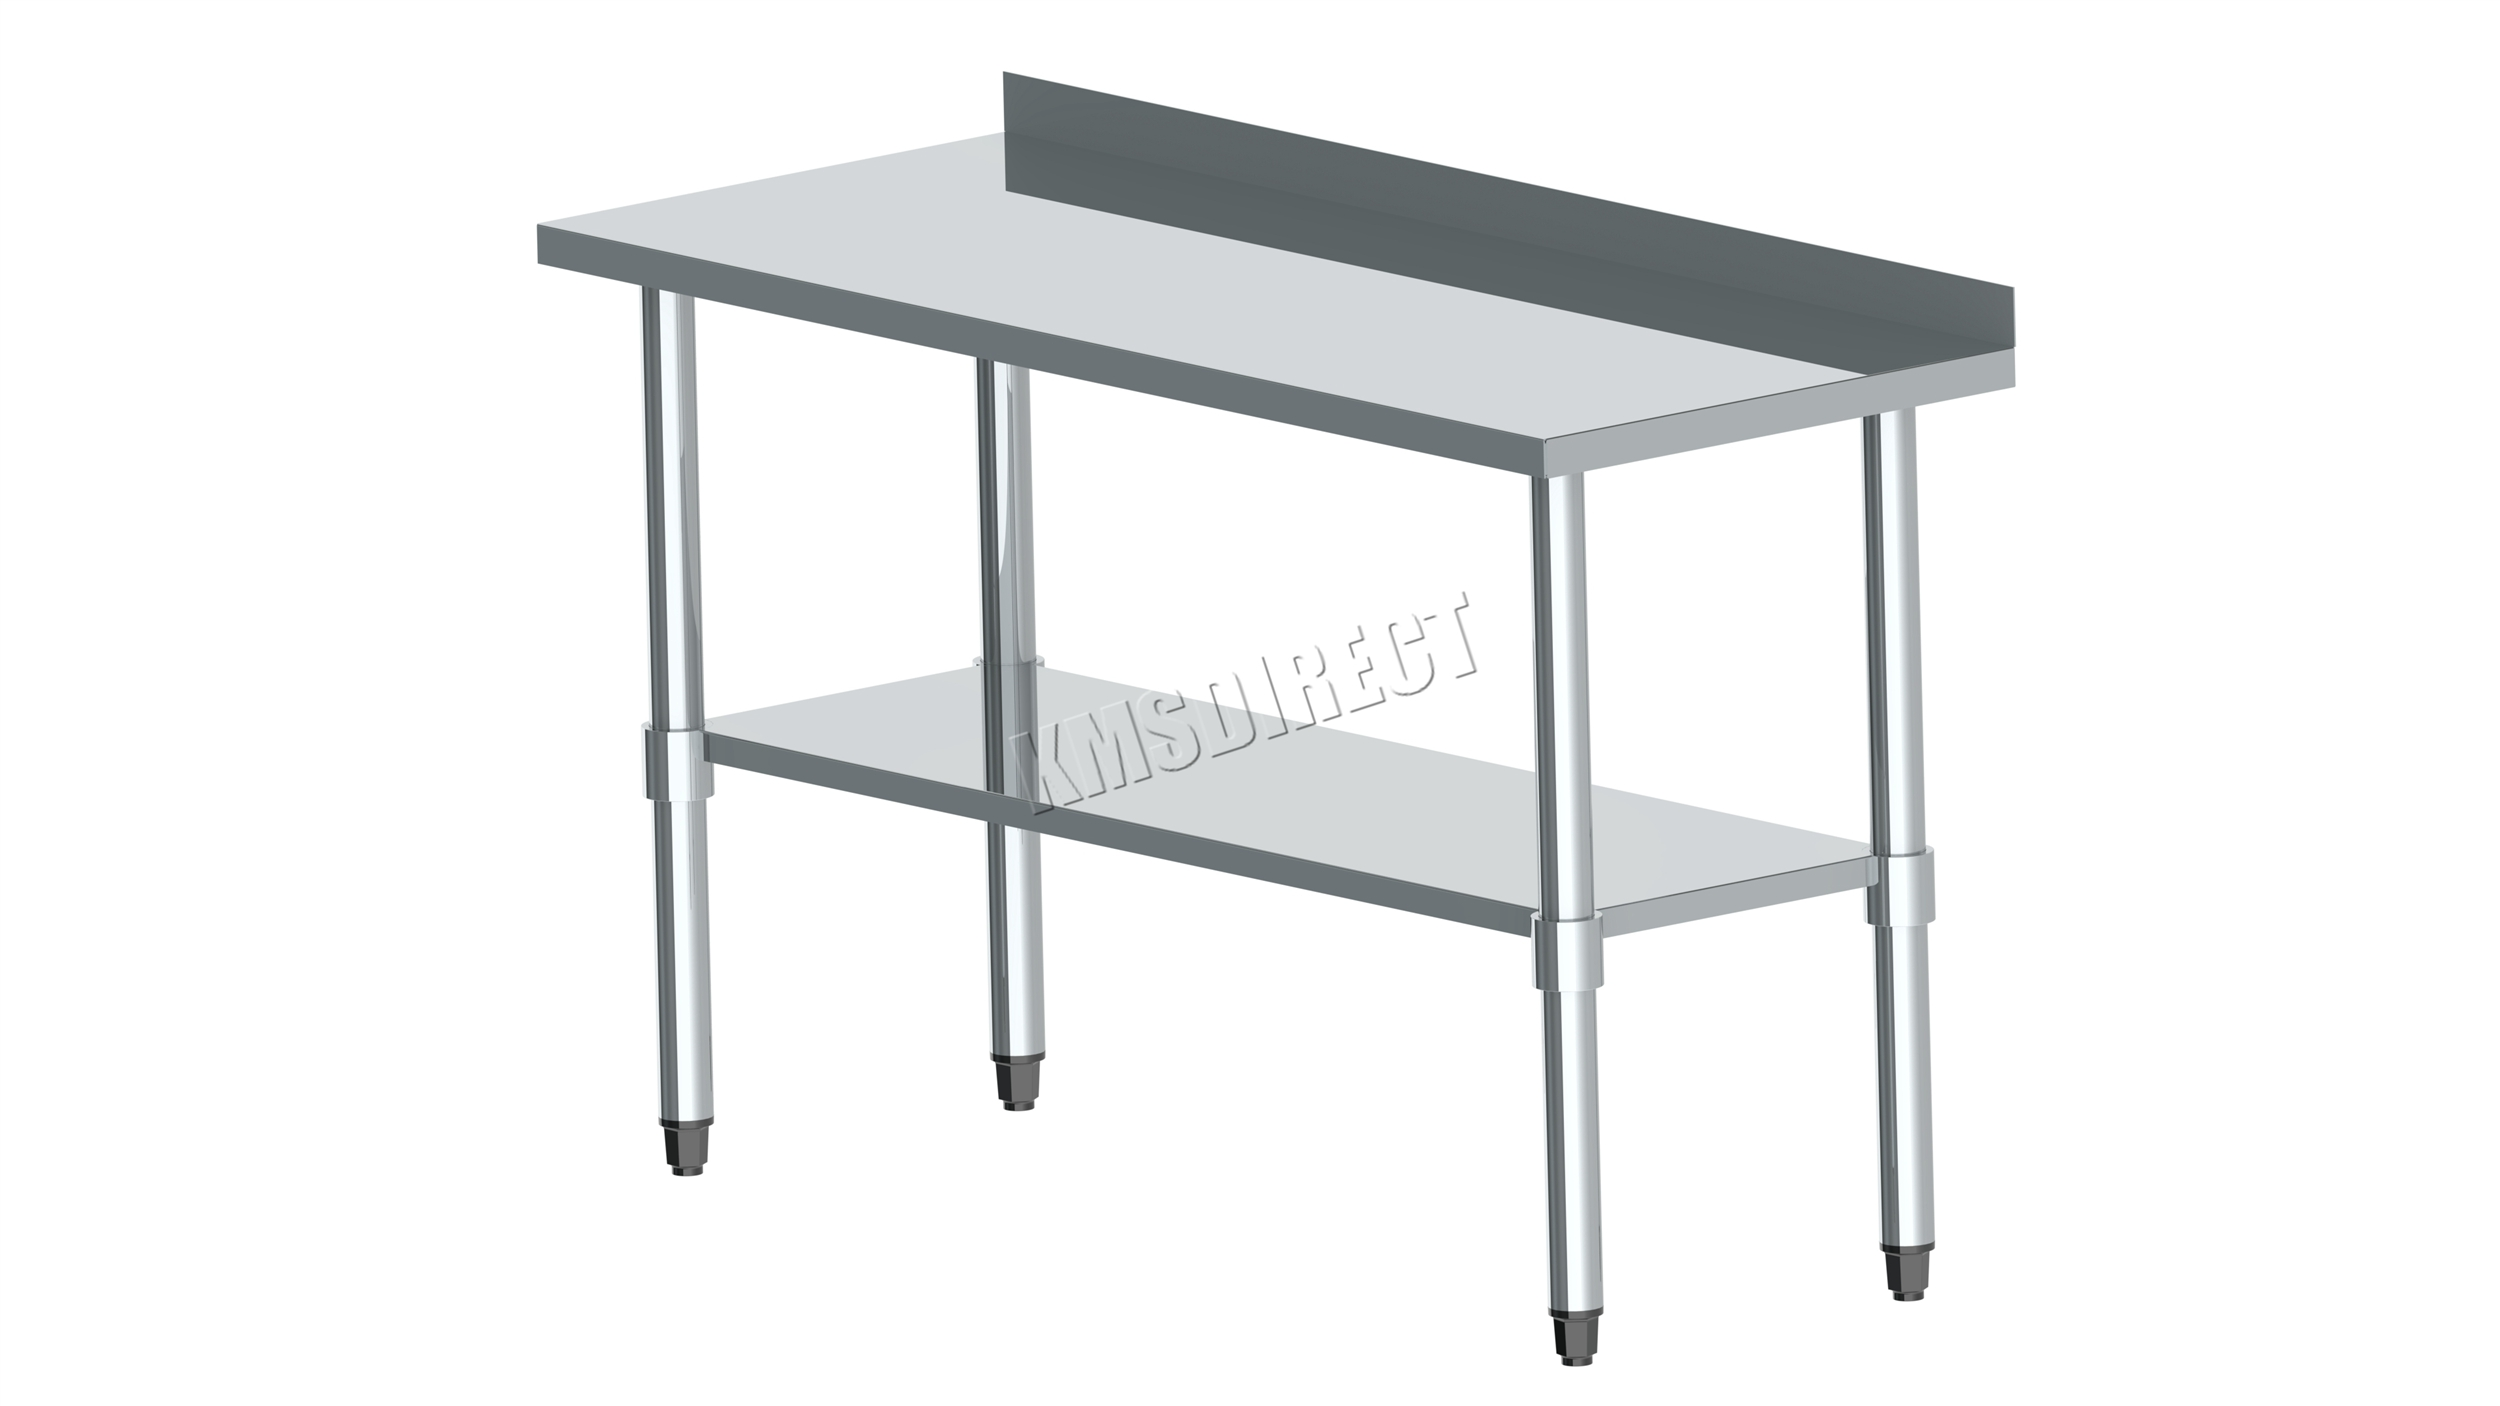 Foxhunter acero inoxidable restauraci n comercial mesa - Mesas de trabajo cocina ...